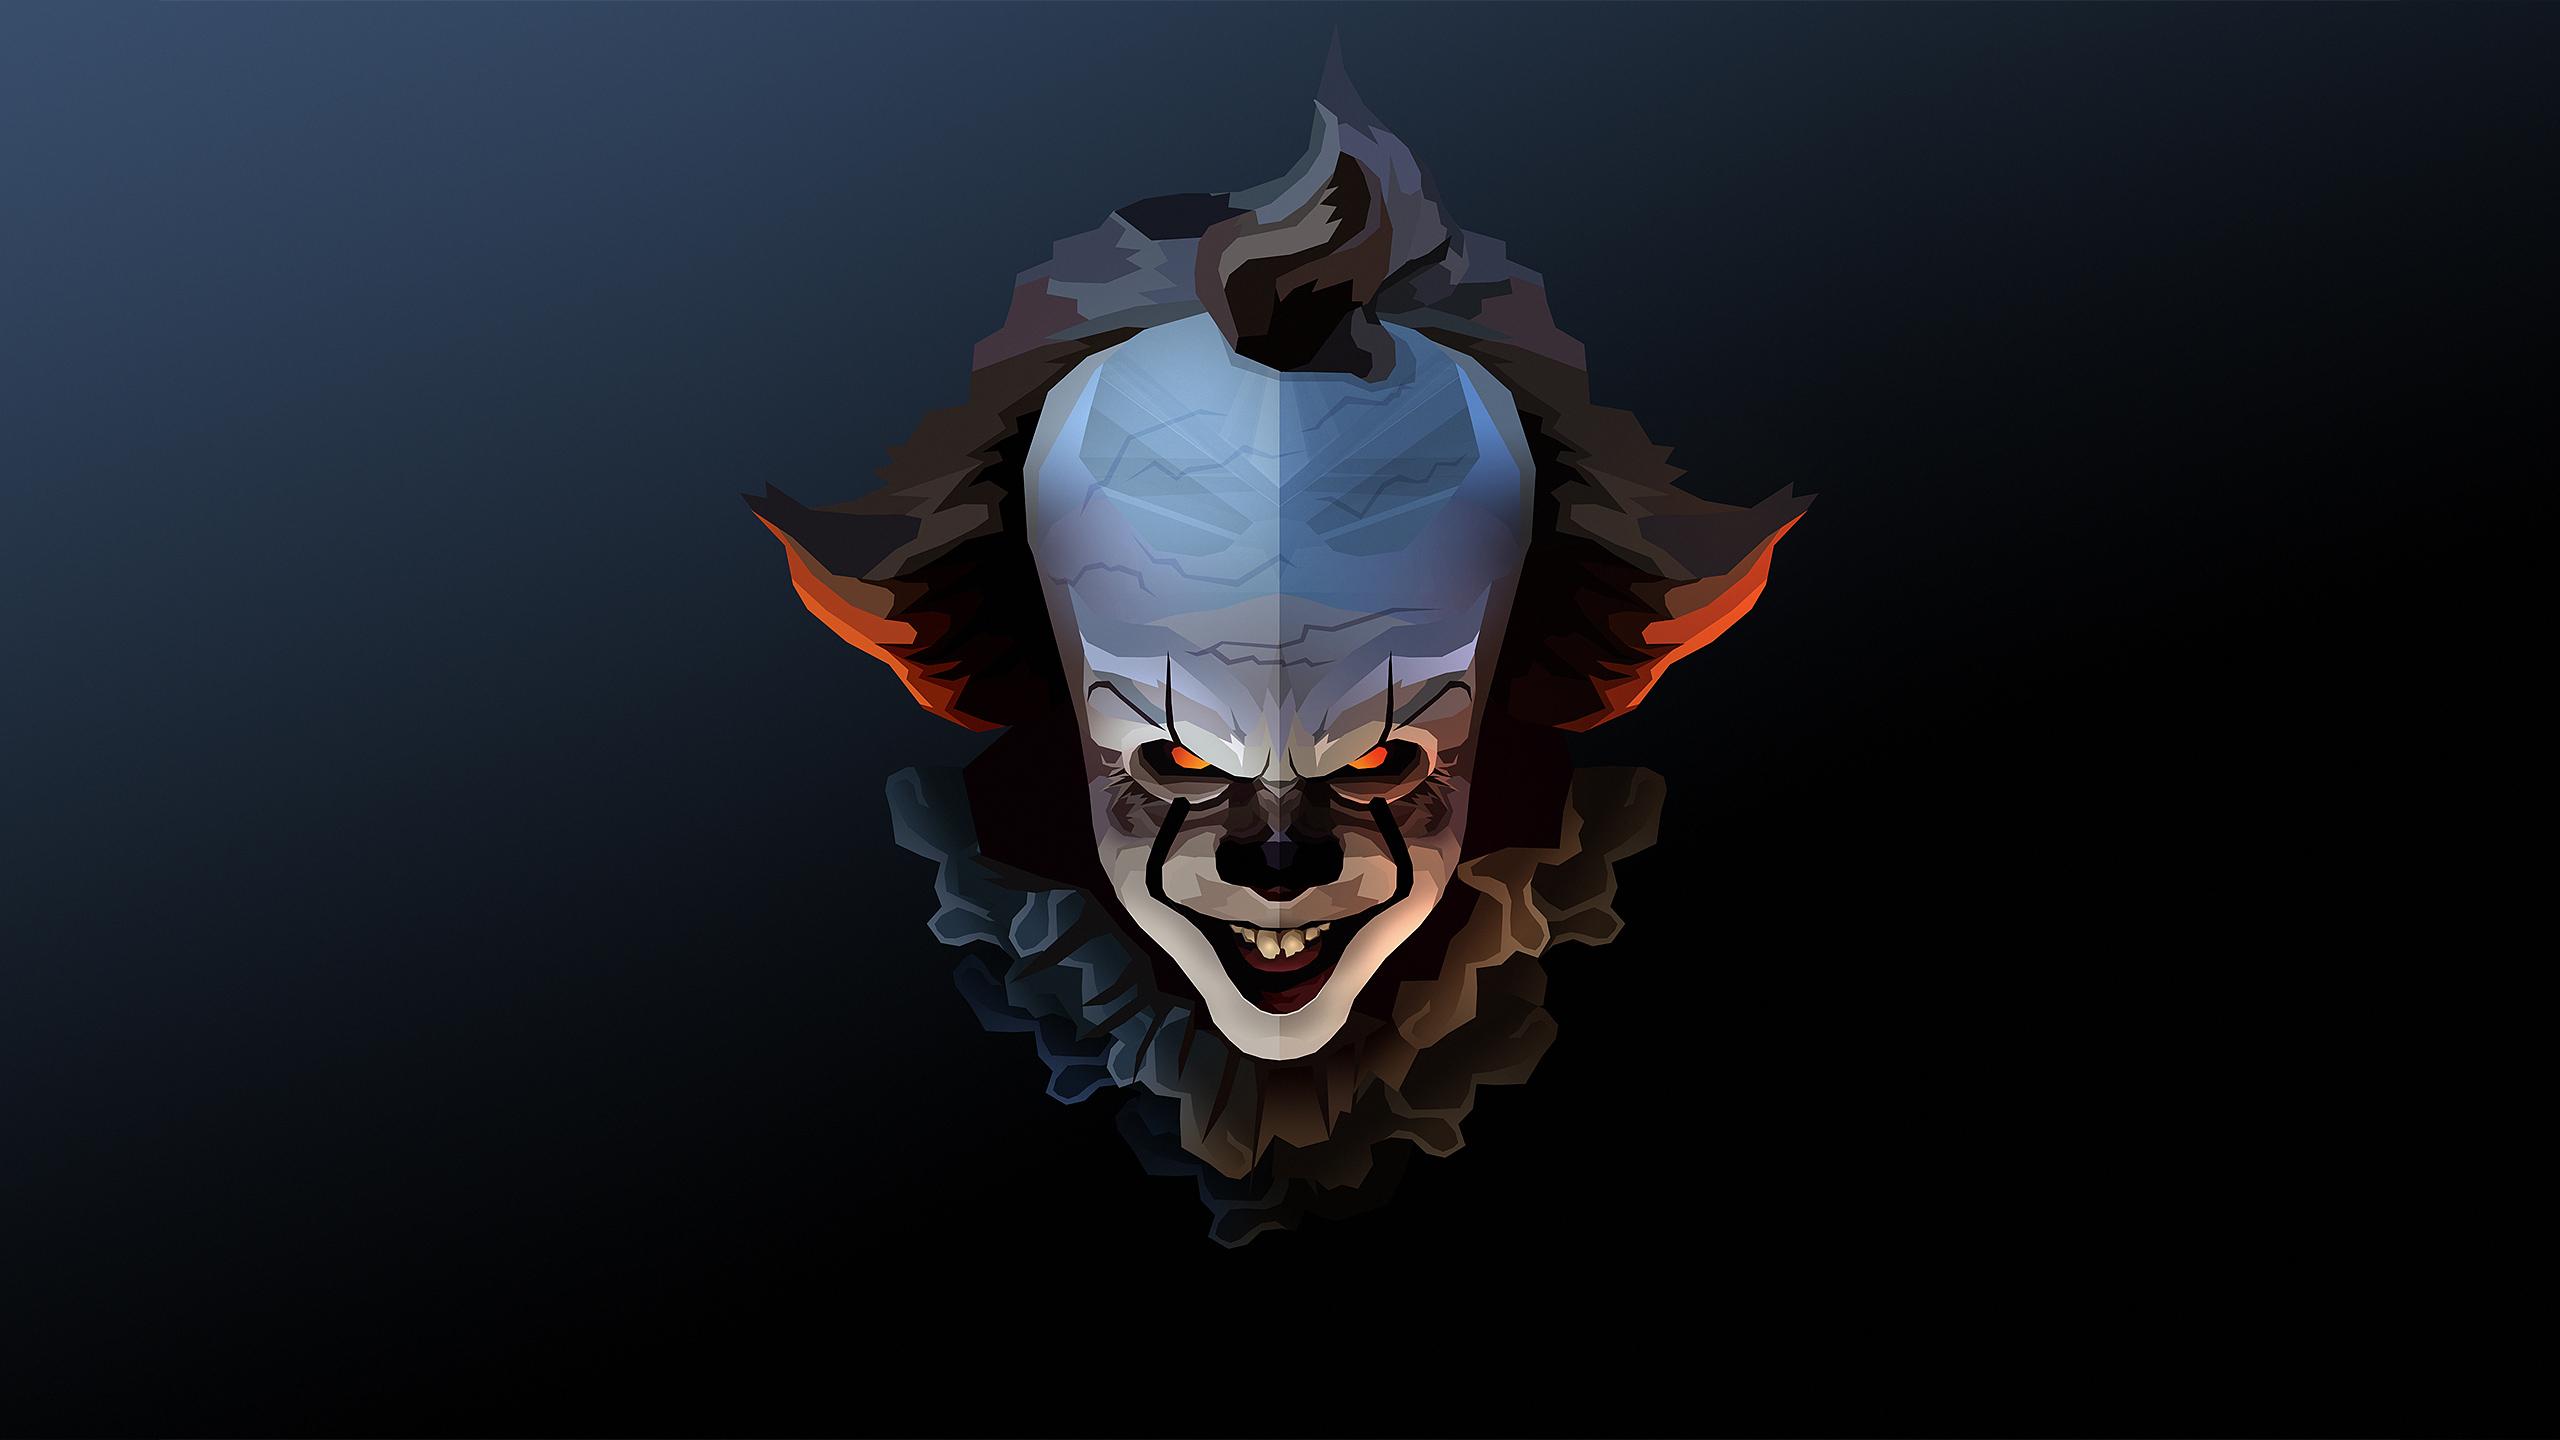 Pennywise the clown halloween fanart hd artist 4k - Pennywise wallpaper ...